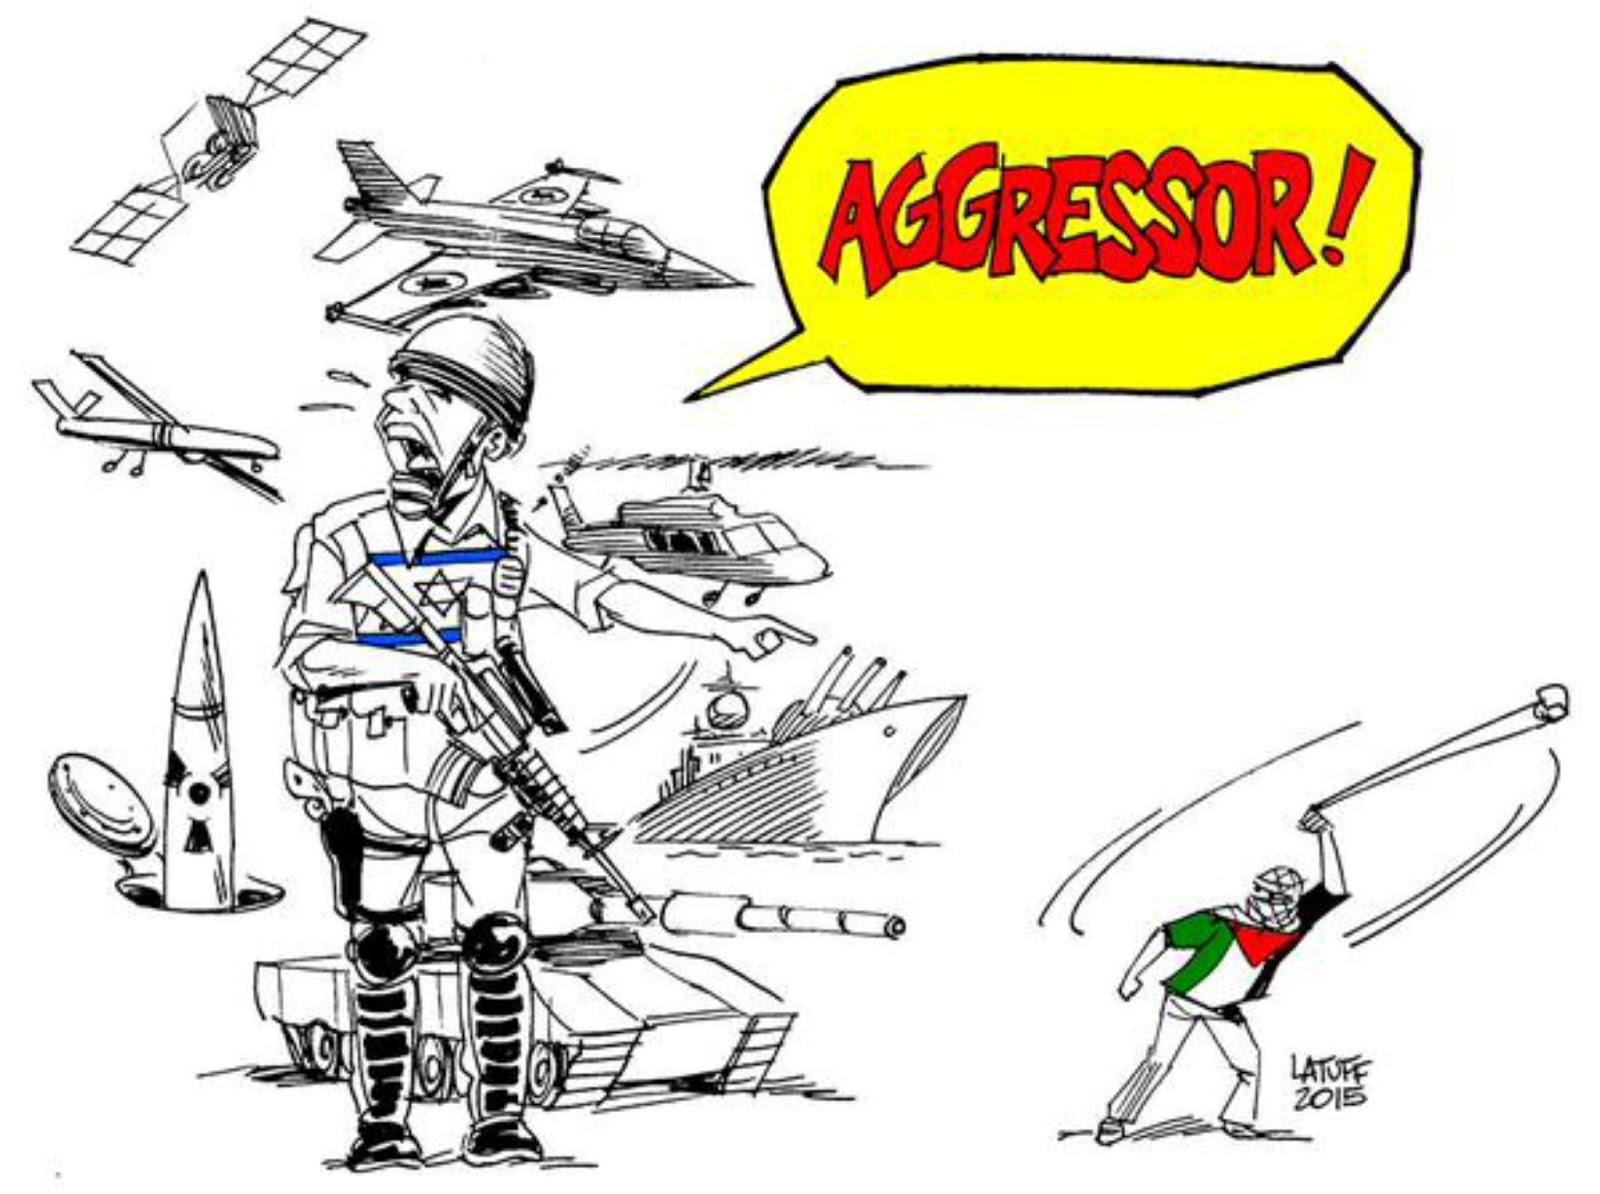 http://2.bp.blogspot.com/-NlC_tTBRyeg/UKcsq6CL6QI/AAAAAAAAExY/q9mACH_Ha6M/s1600/Gaza,+Palestine.+November+2012.+A+response+to+Zionist+oppression.+%231ab..jpg?SSImageQuality=Full